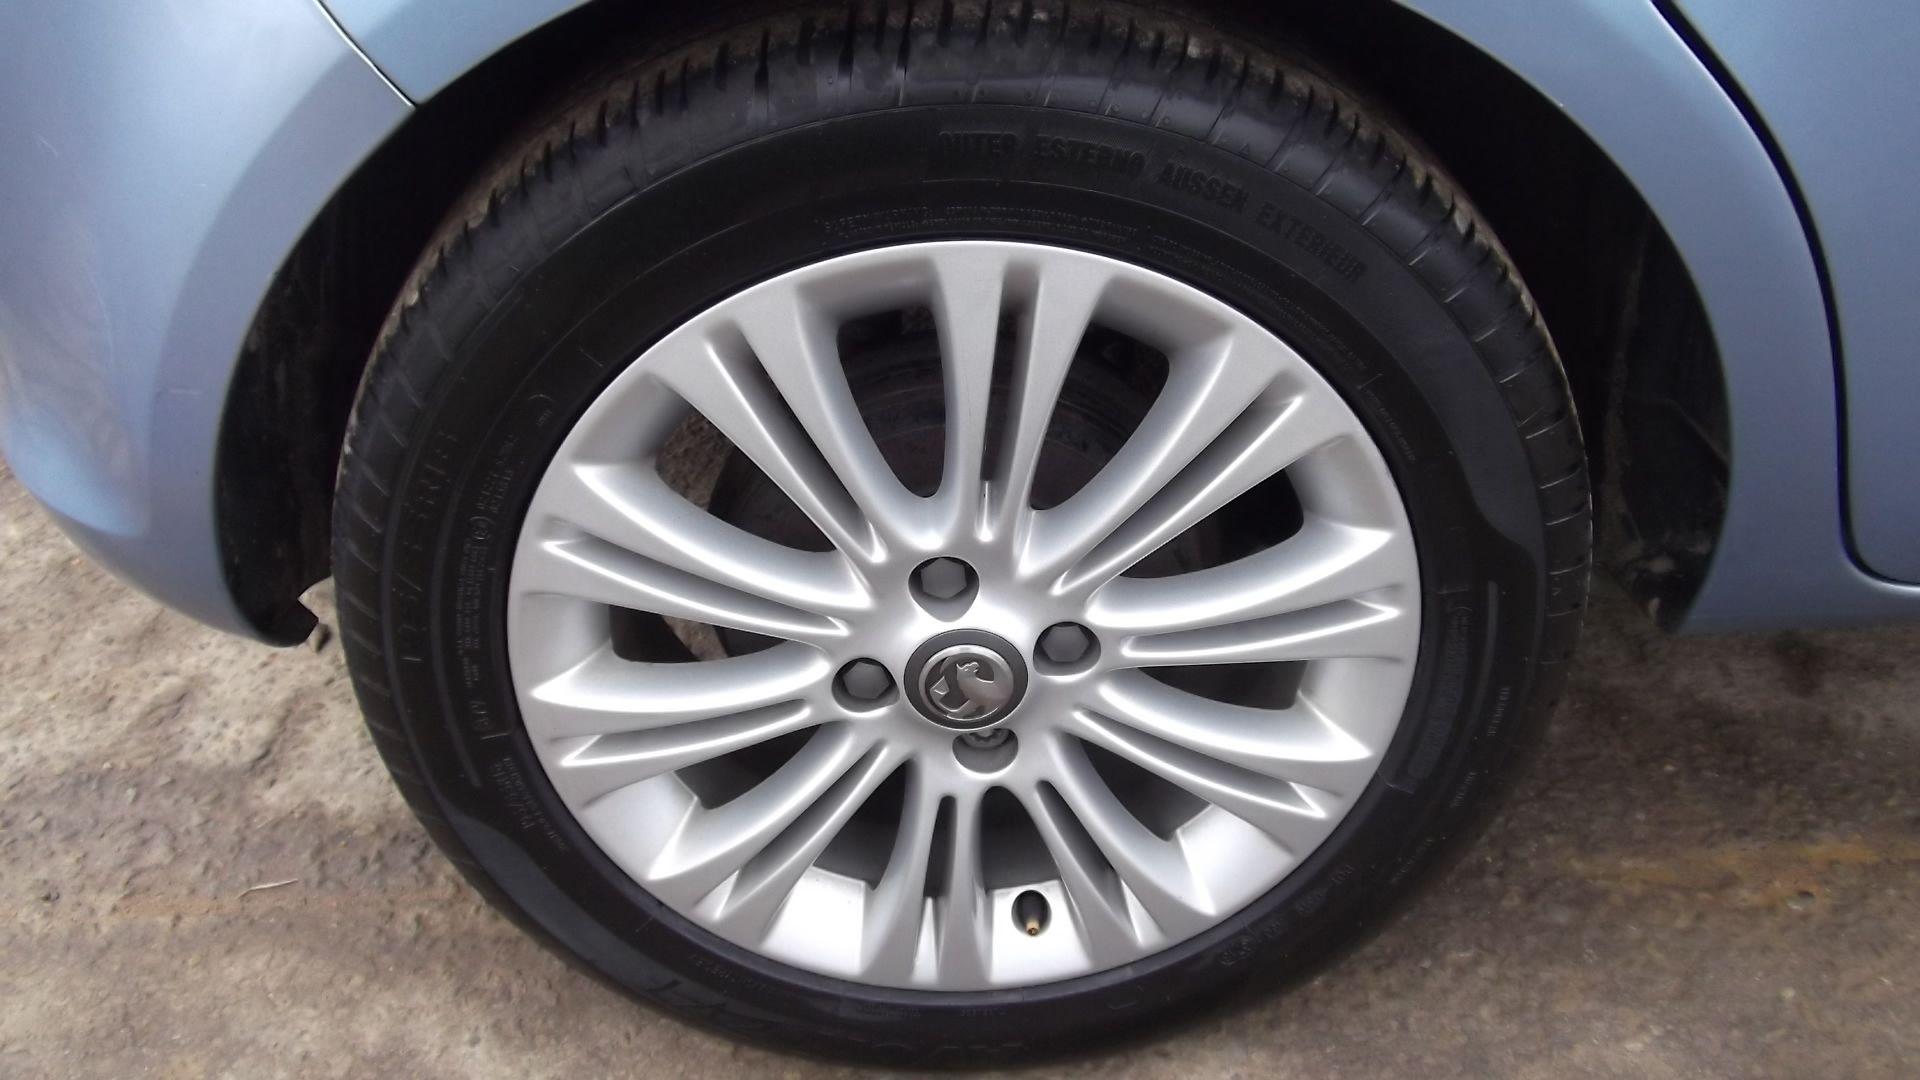 2014 Vauxhall Corsa Se 5Dr Hatchback - Full Service History - CL505 - NO VAT ON THE HAMMER - - Image 24 of 24